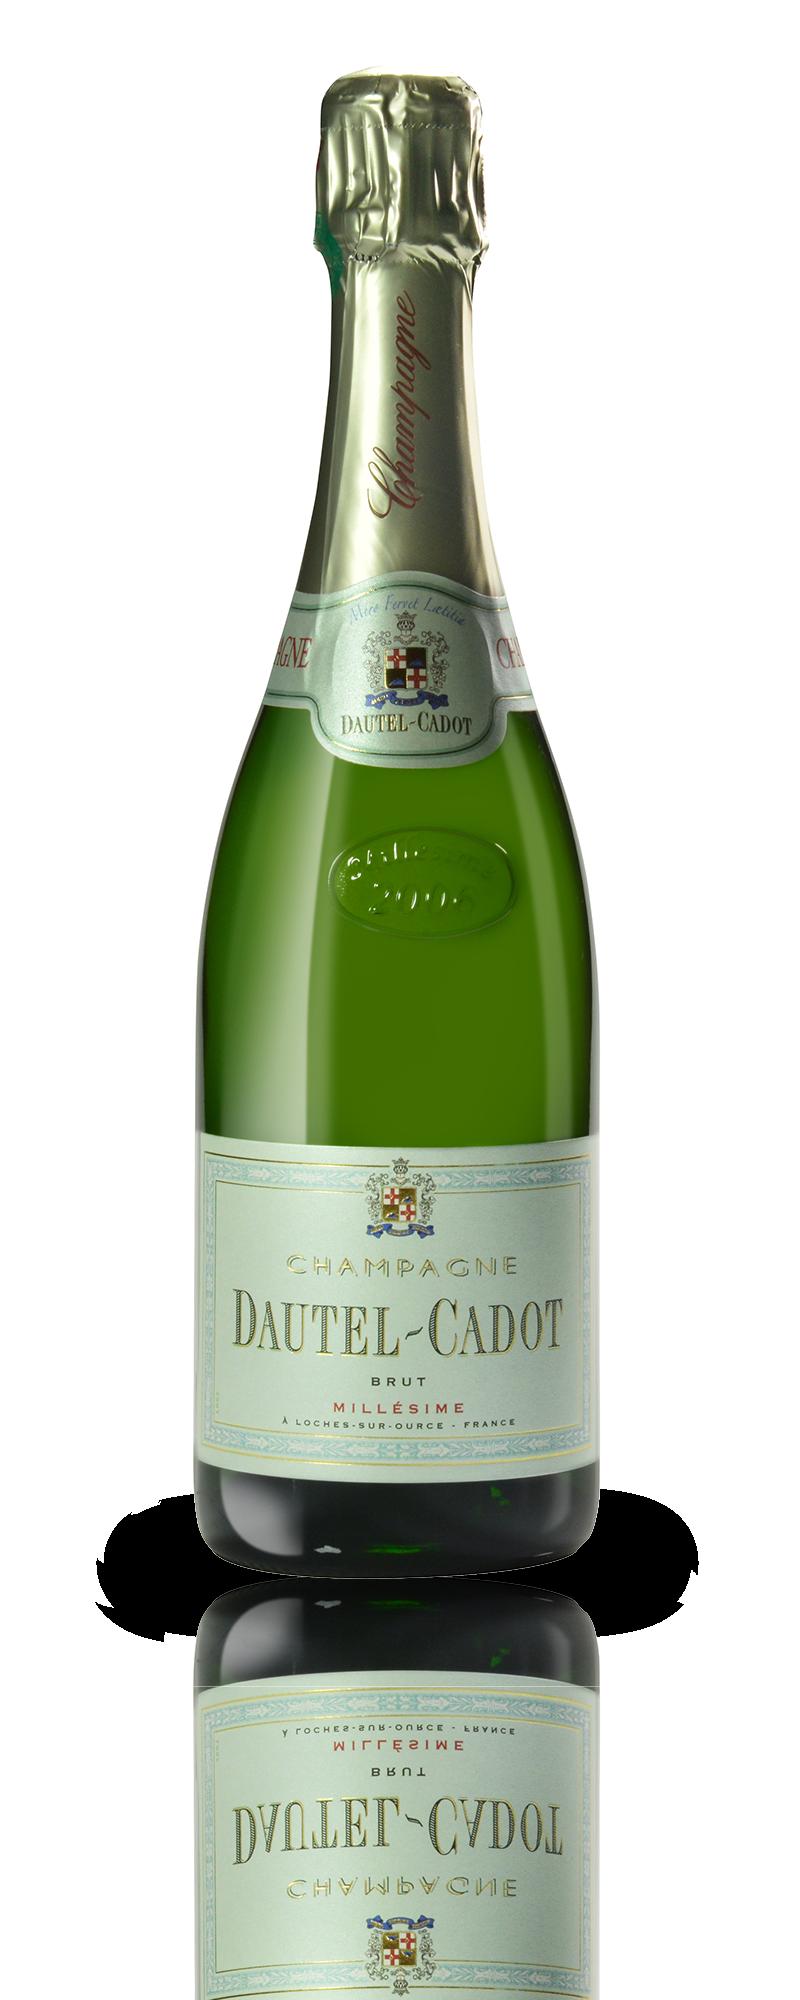 champagne-dautel-cadot-cuvee-millesime-brut